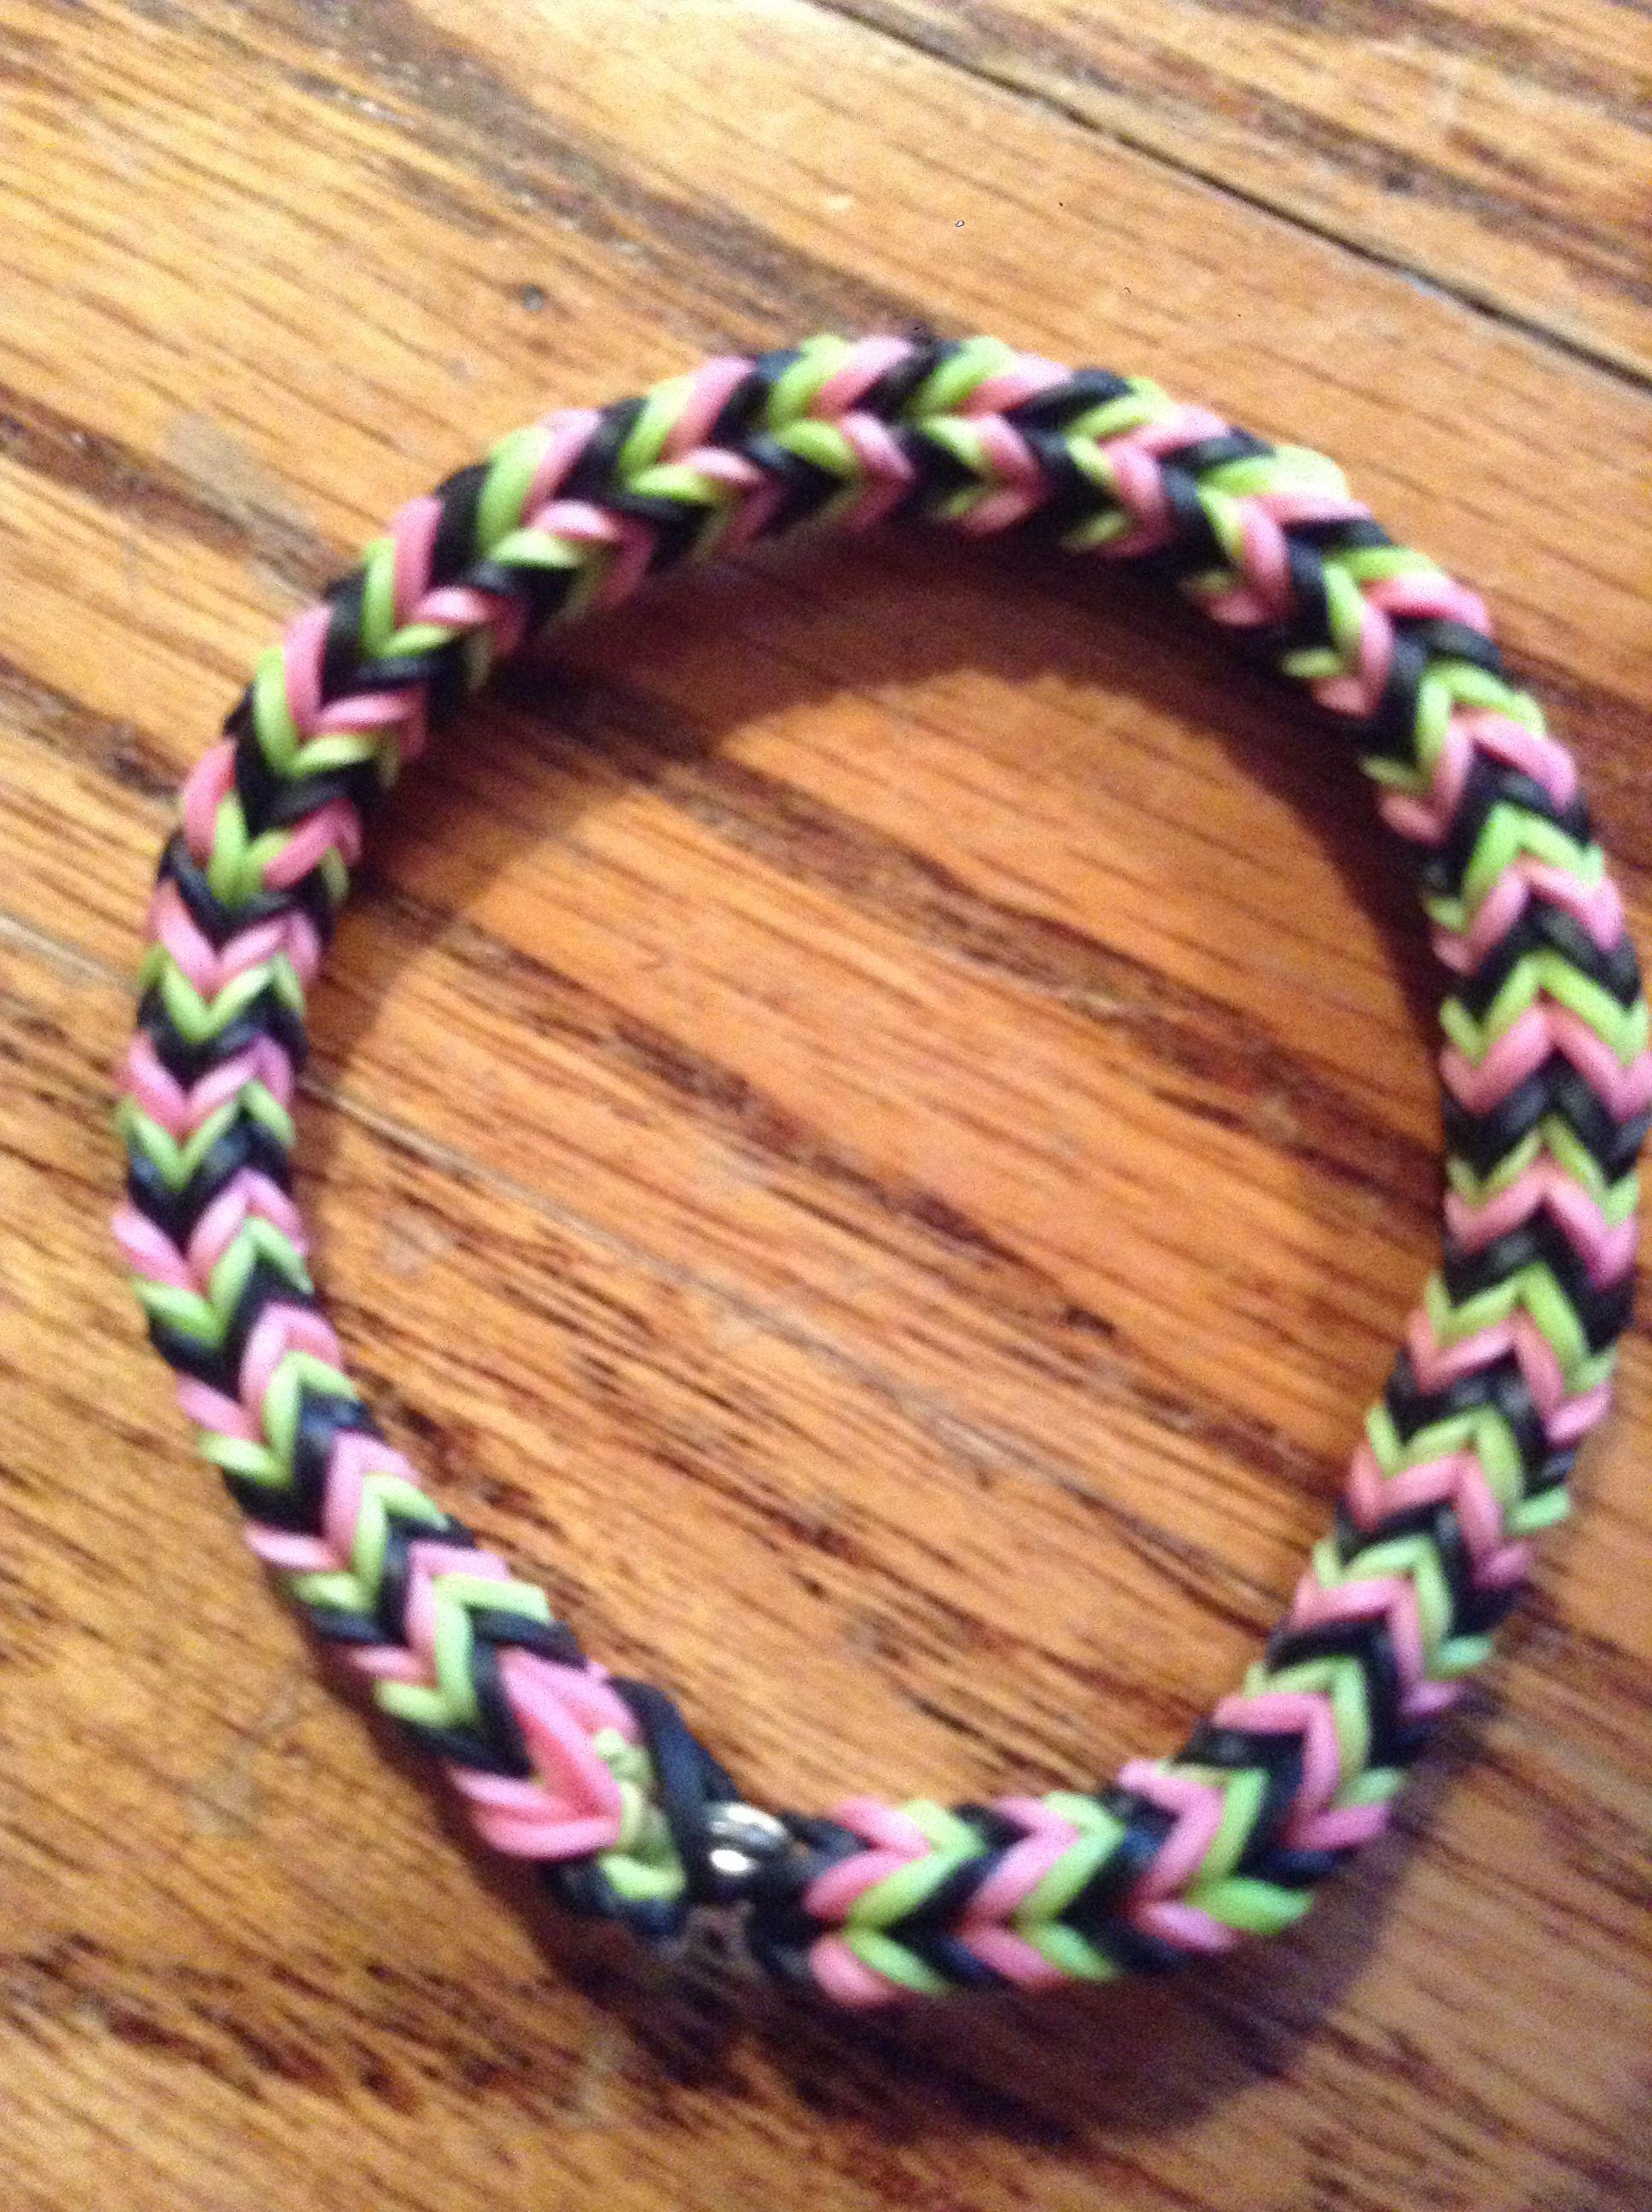 Fashion week Loom rainbow bracelets fishtail pattern photo for girls